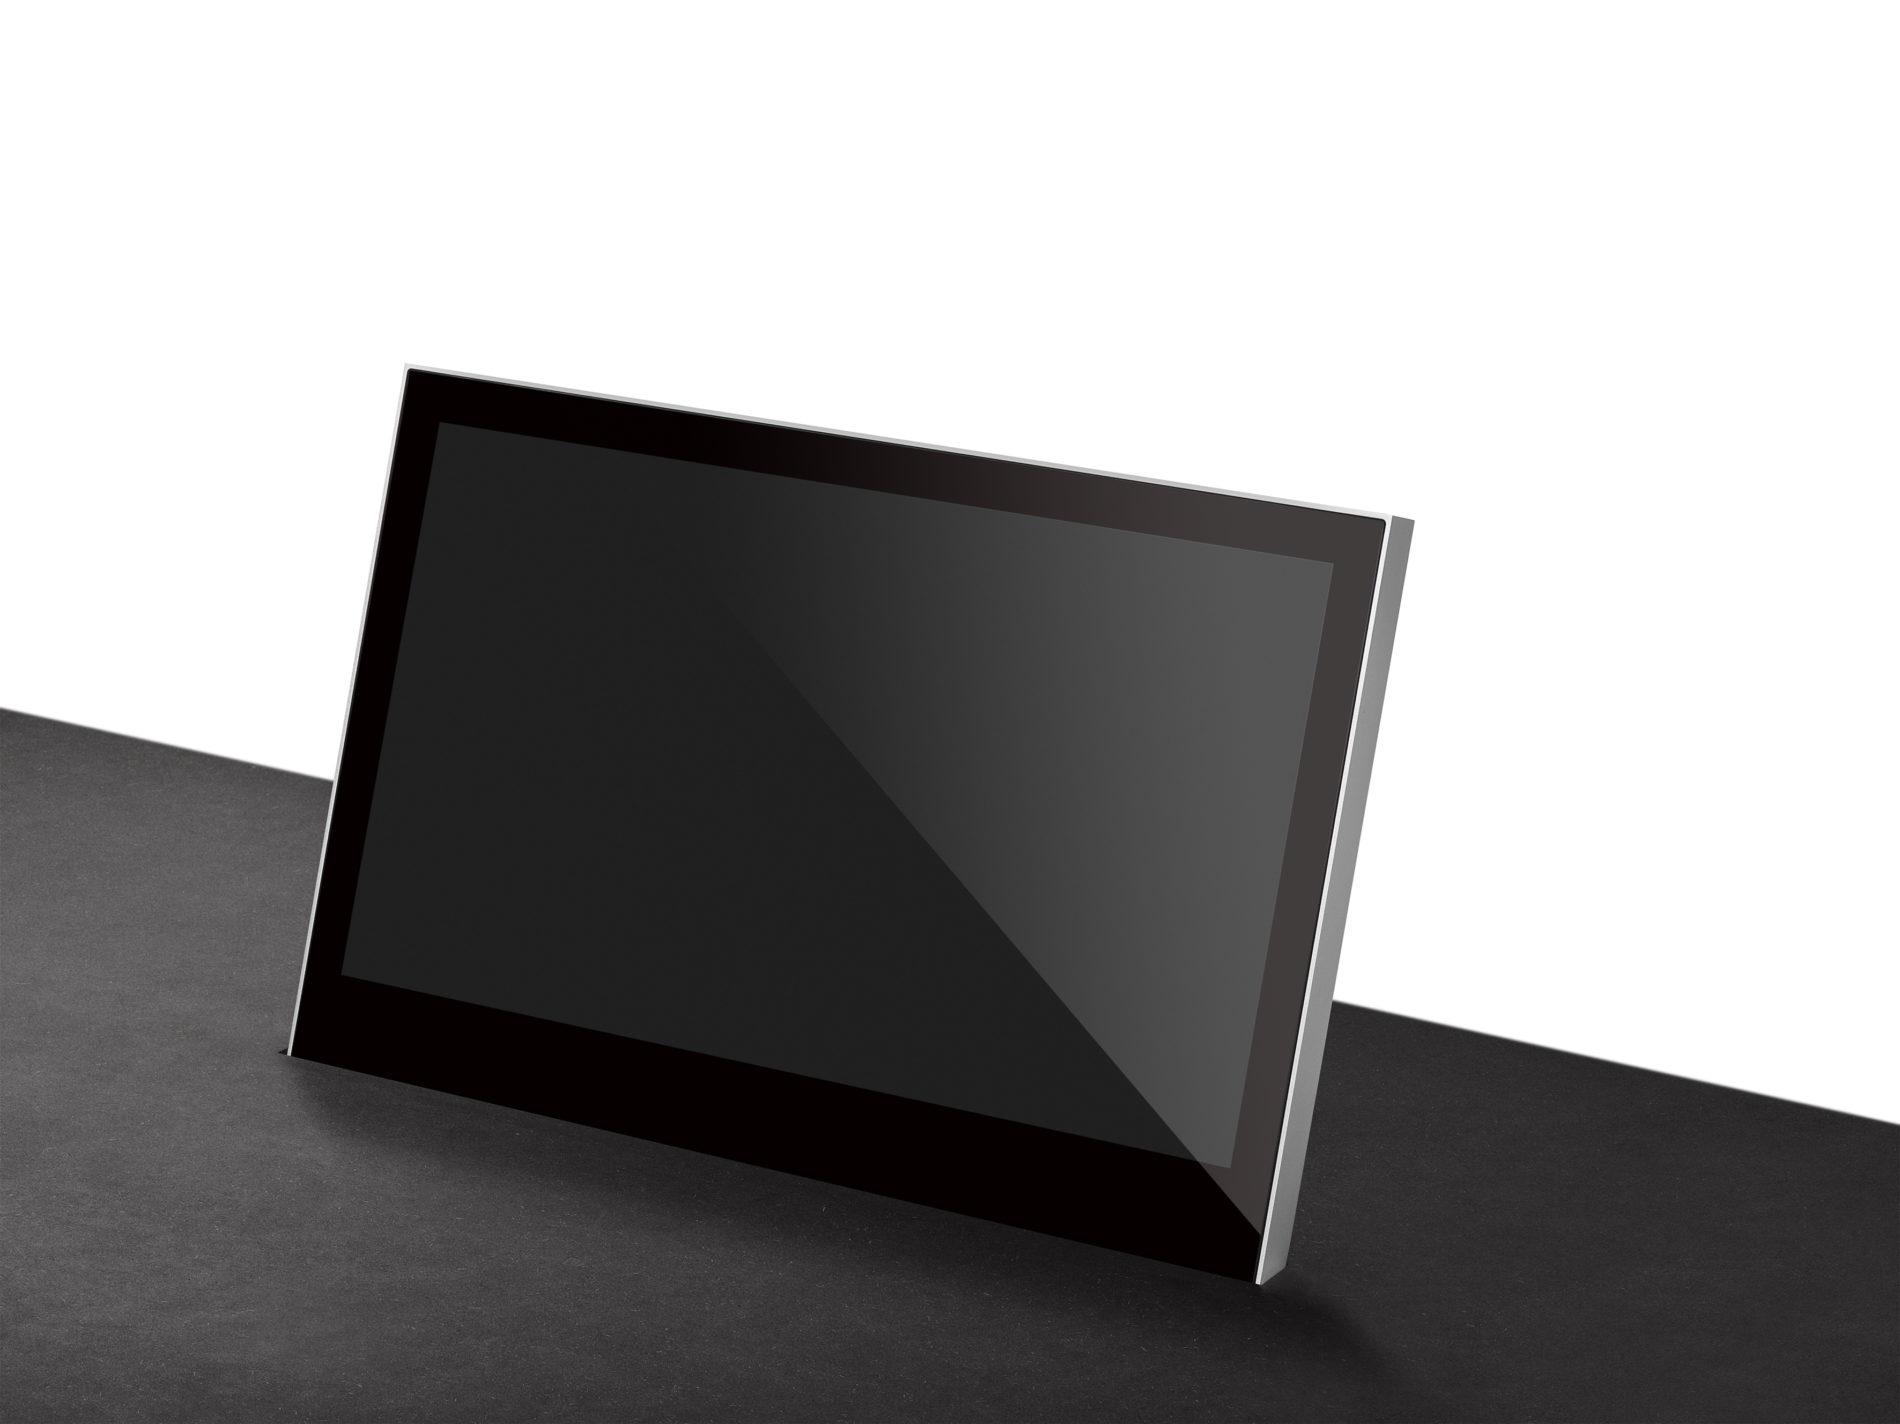 monitor oculto totalmente en la mesa